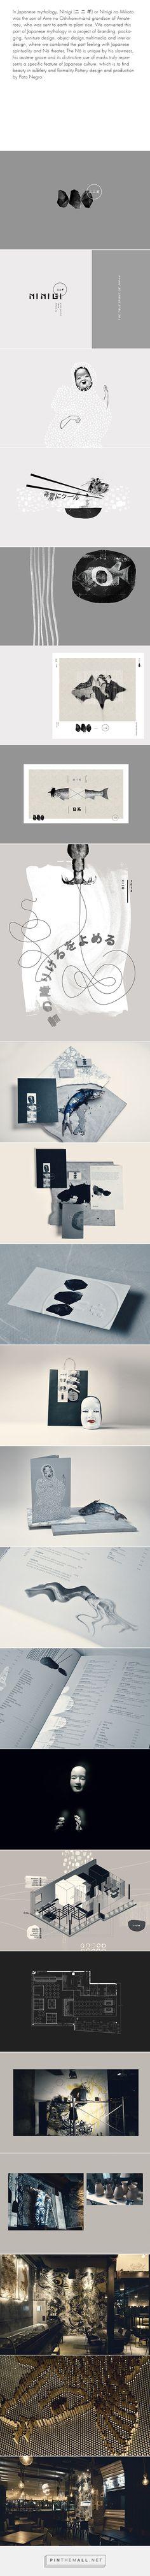 Ninigi identity packaging branding on Behance by